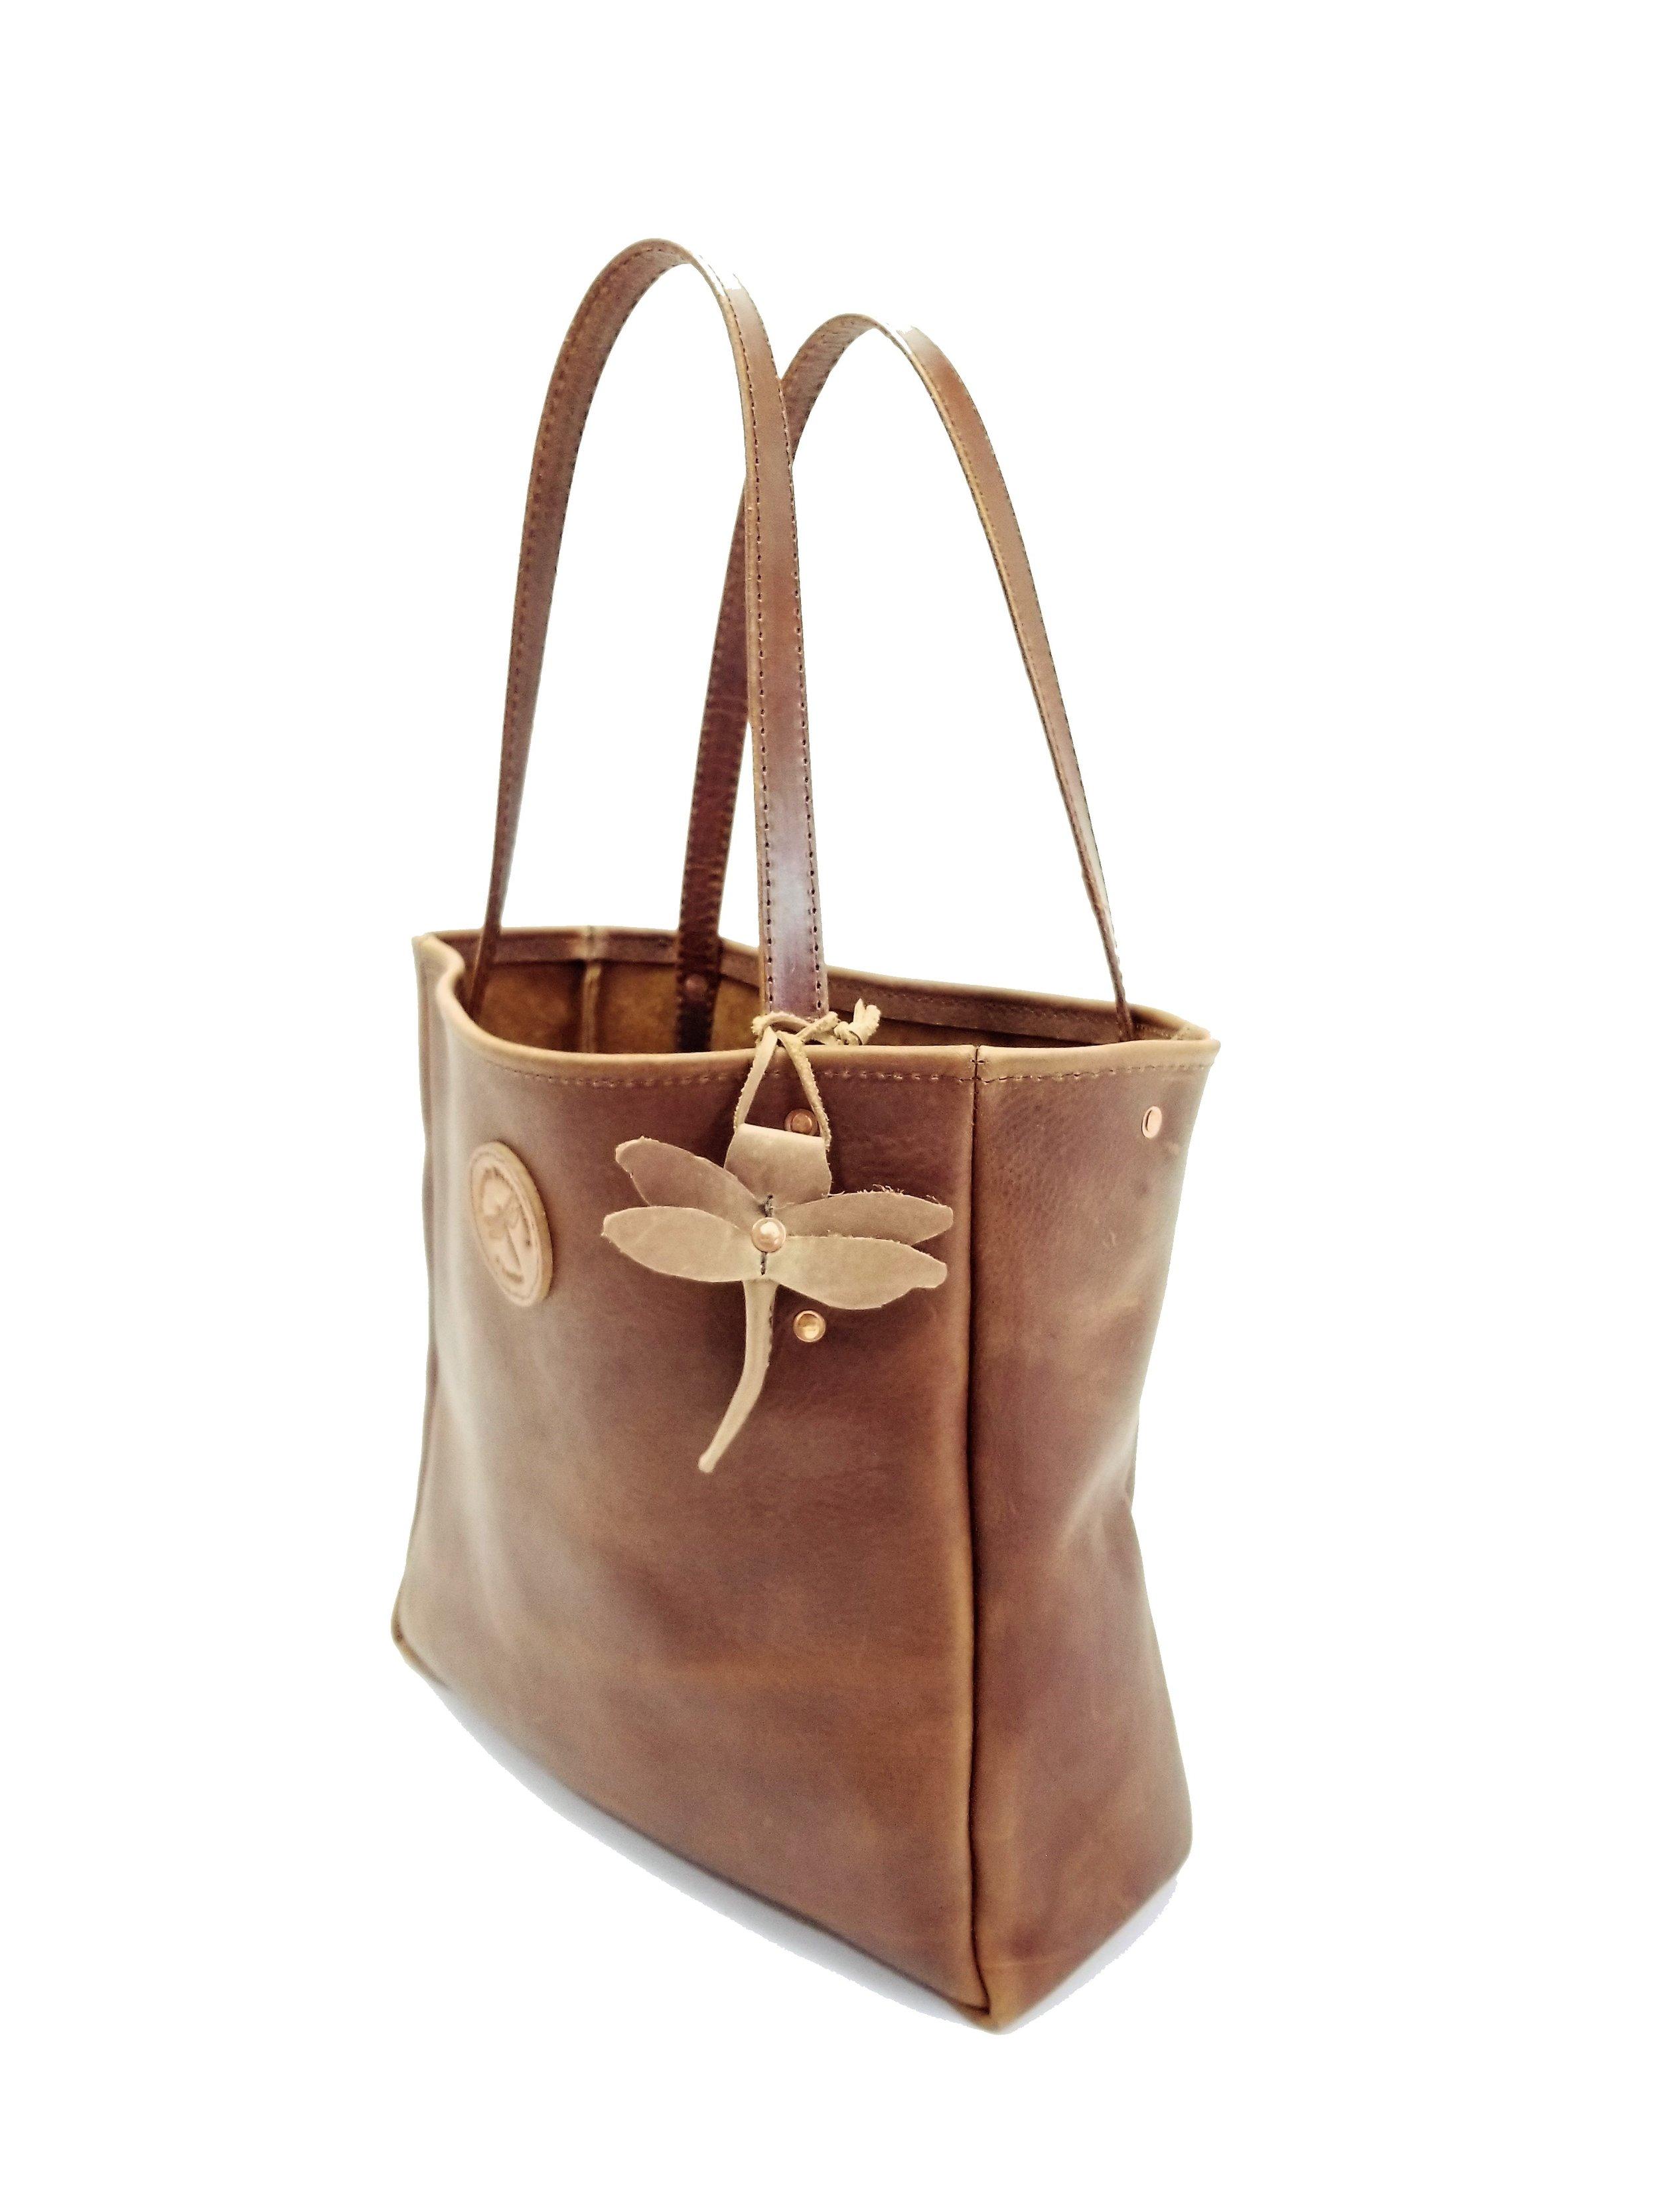 tote - leather tote - leather purse